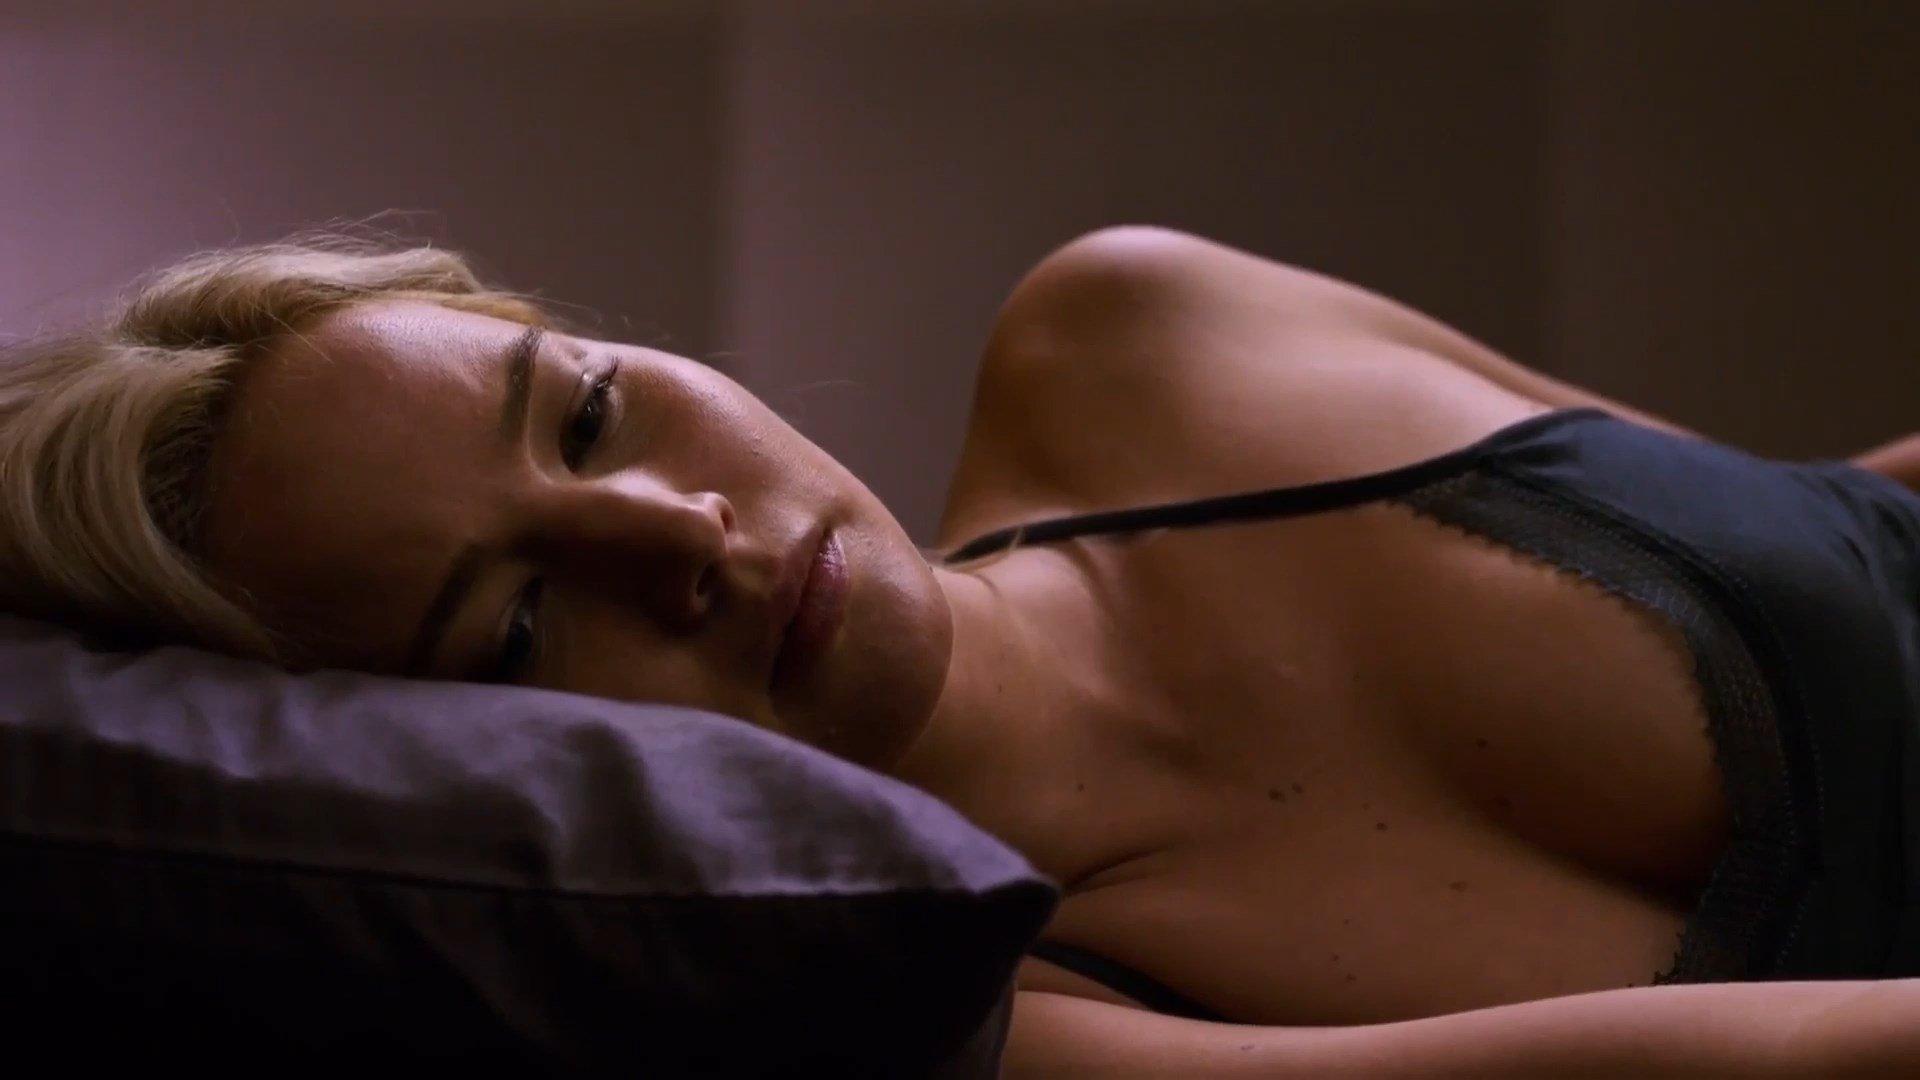 erotica hotel Jennifer lawrence